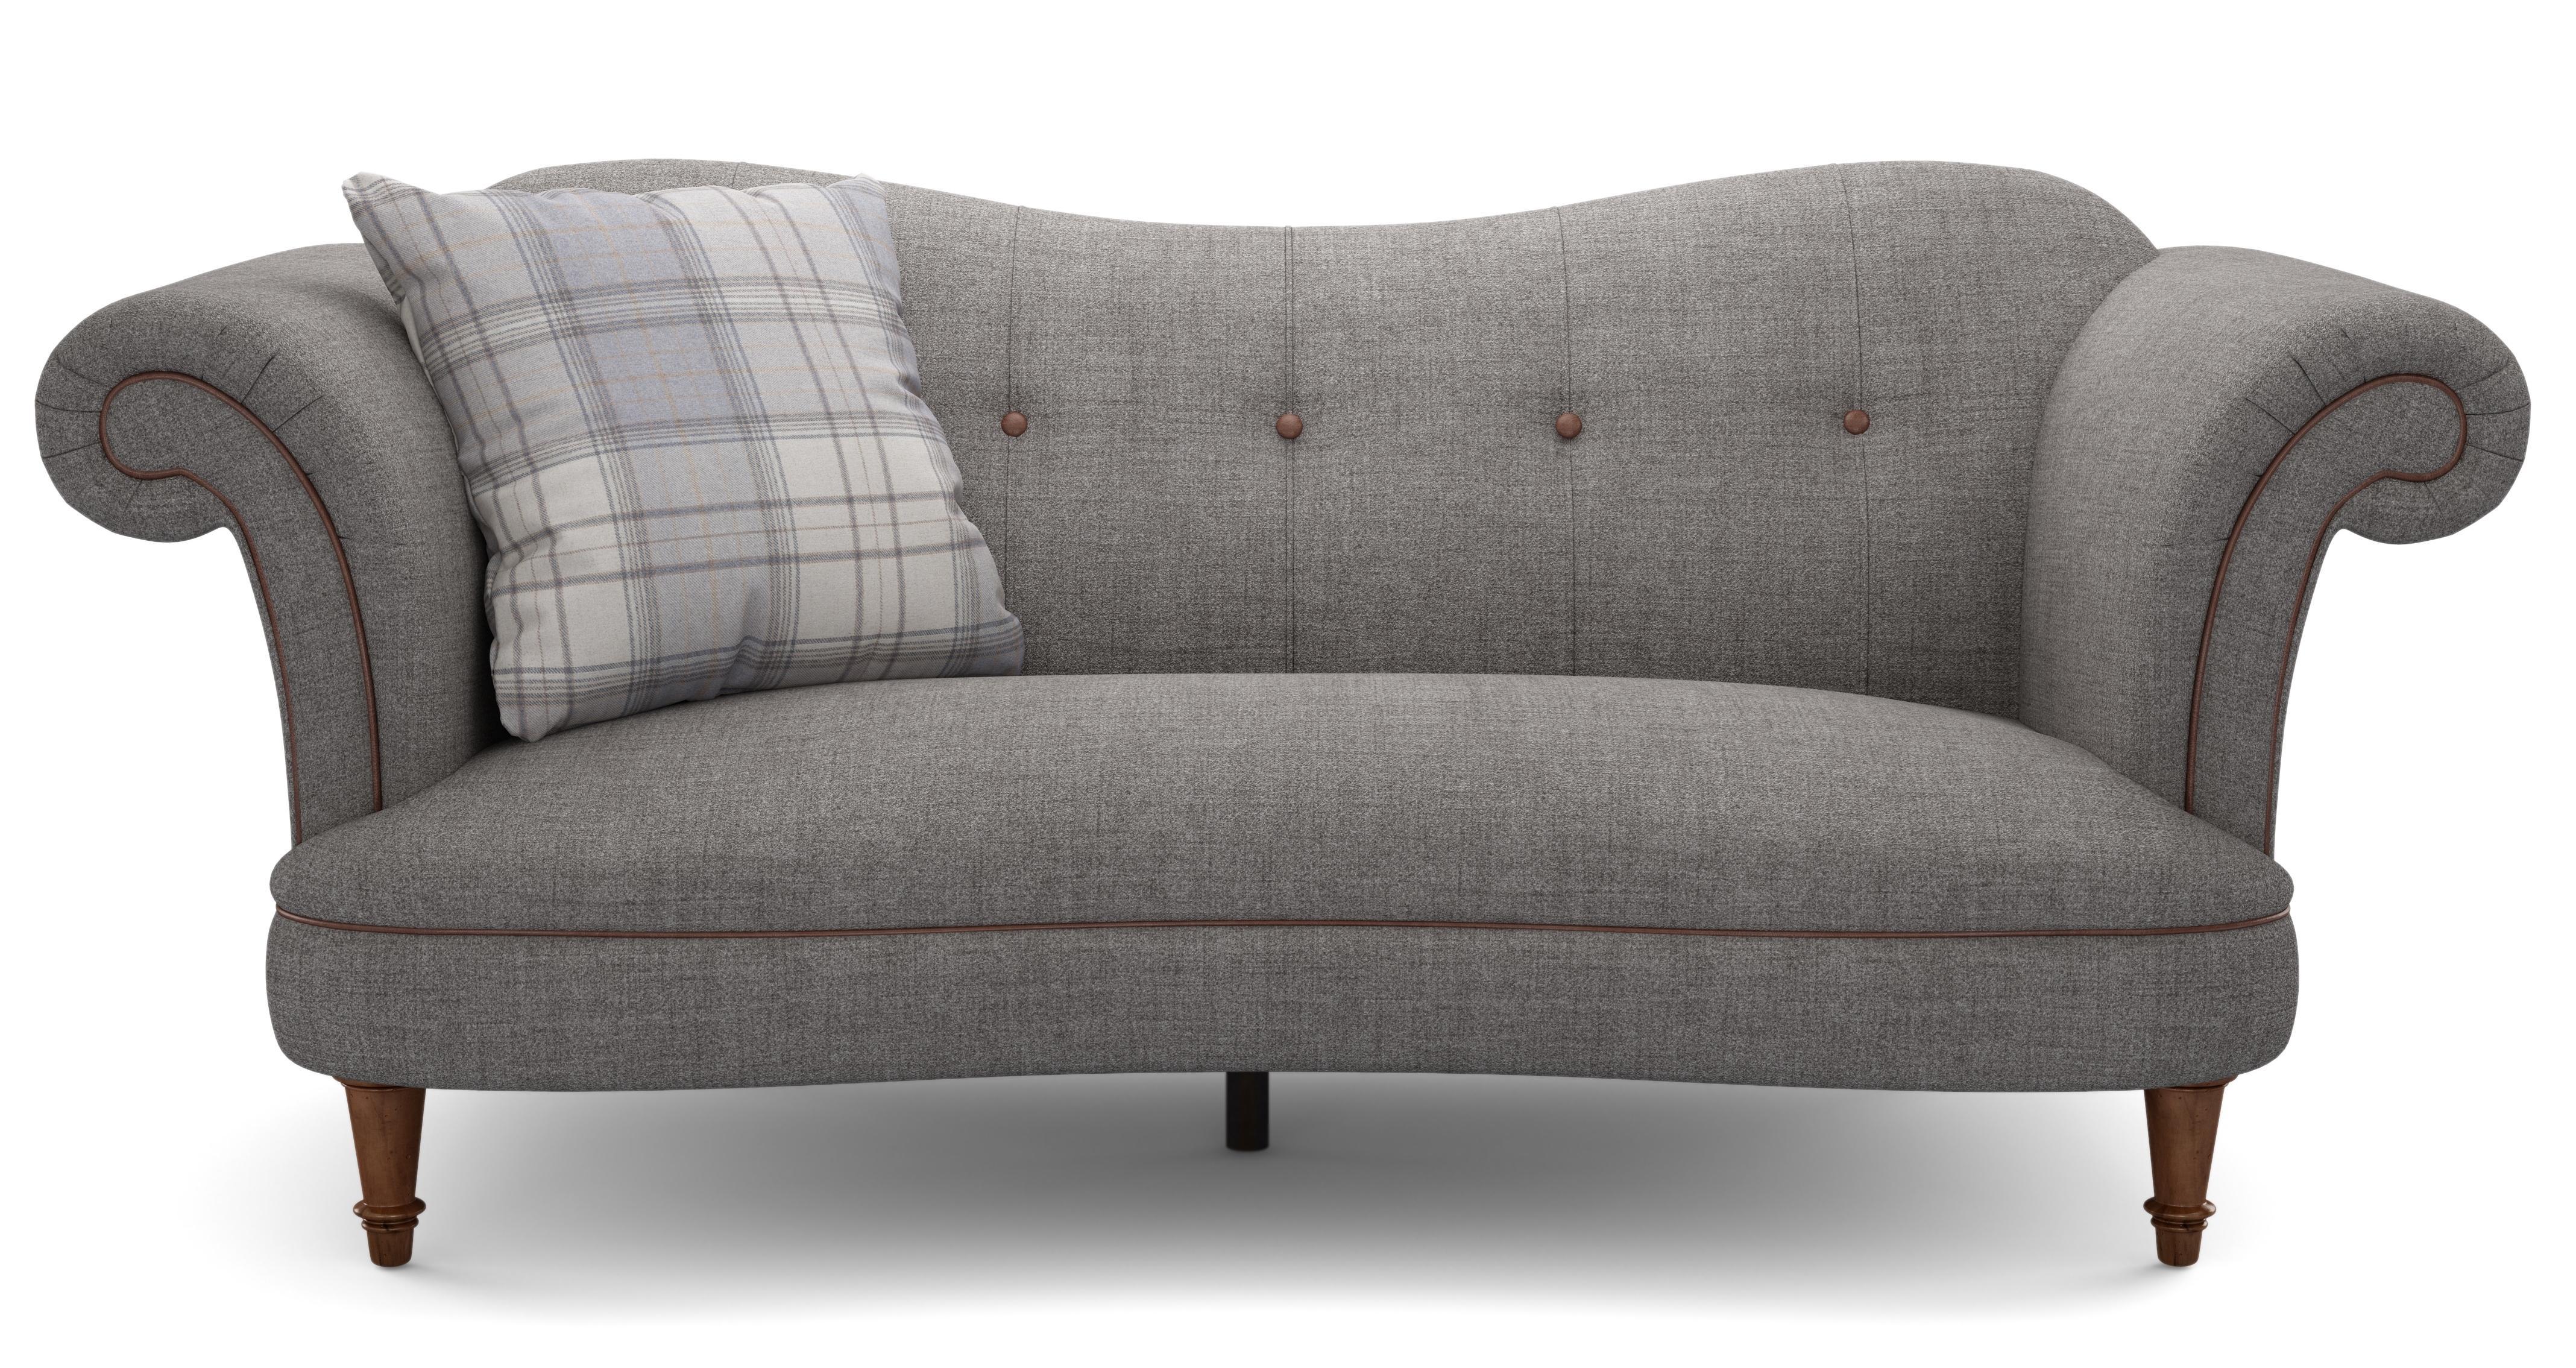 dfs sofas 2 seater salon sofa furniture moray ireland